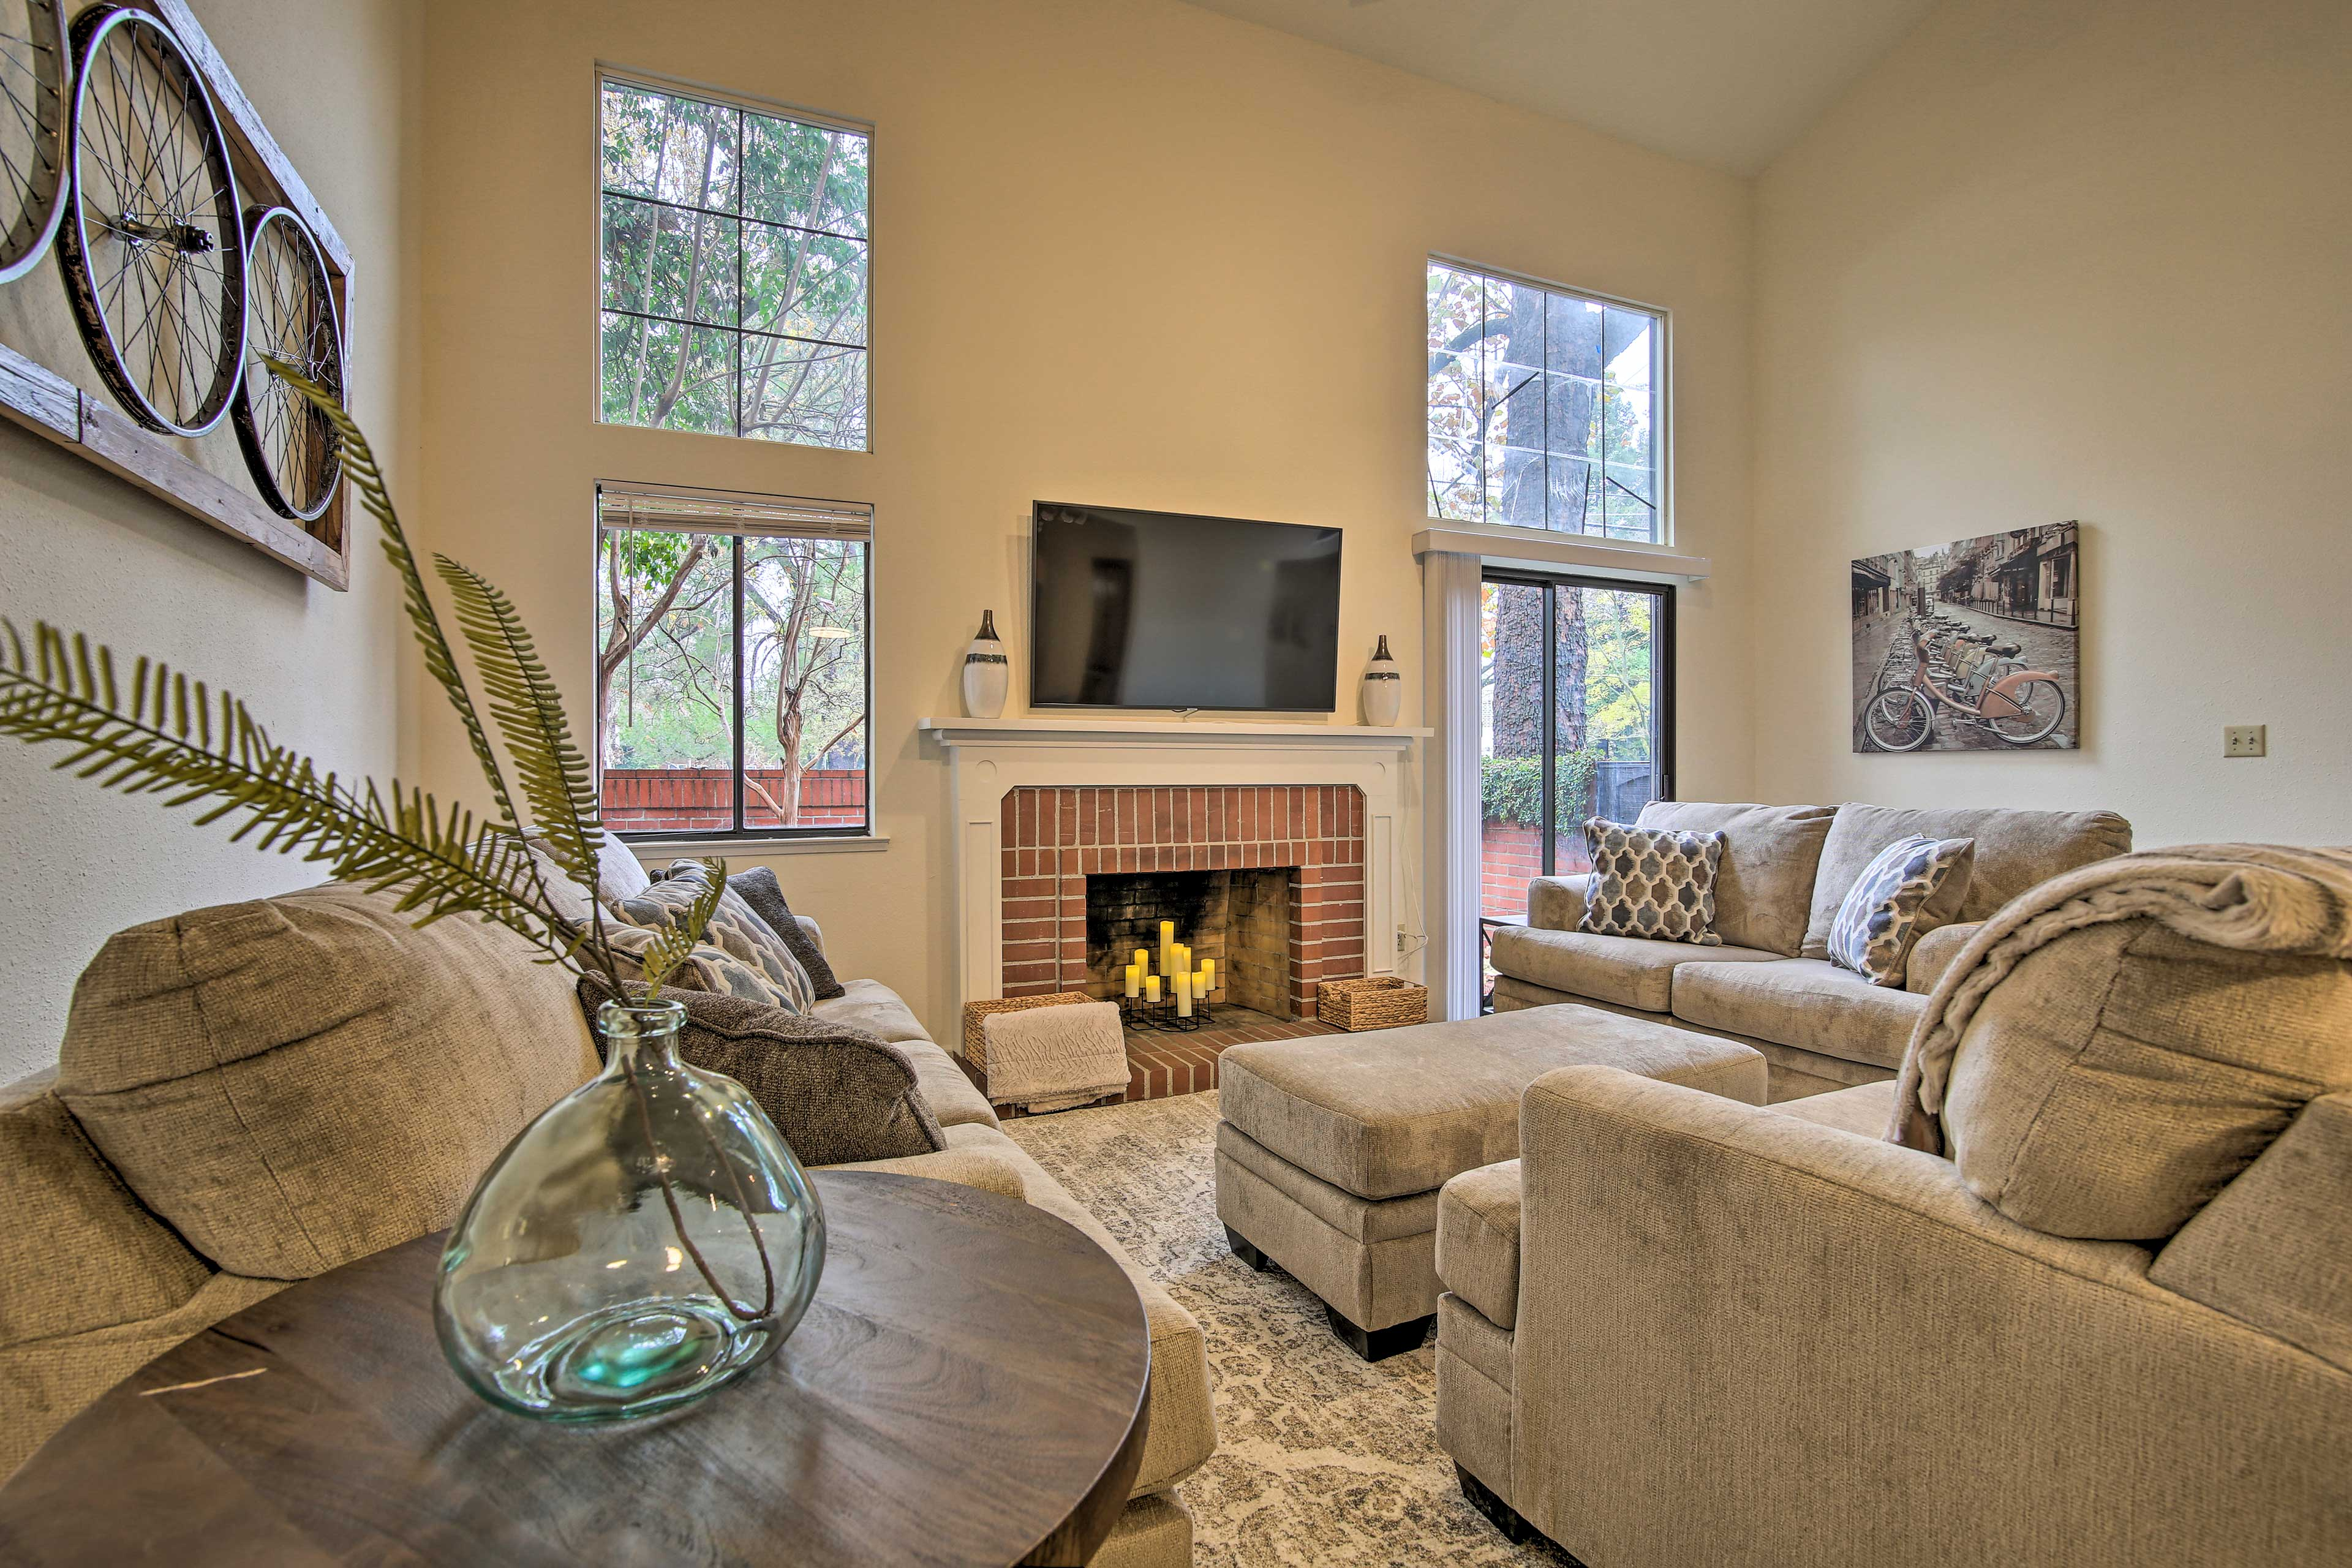 Come stay at this 3-bedroom, 2-bathroom condo in Davis!